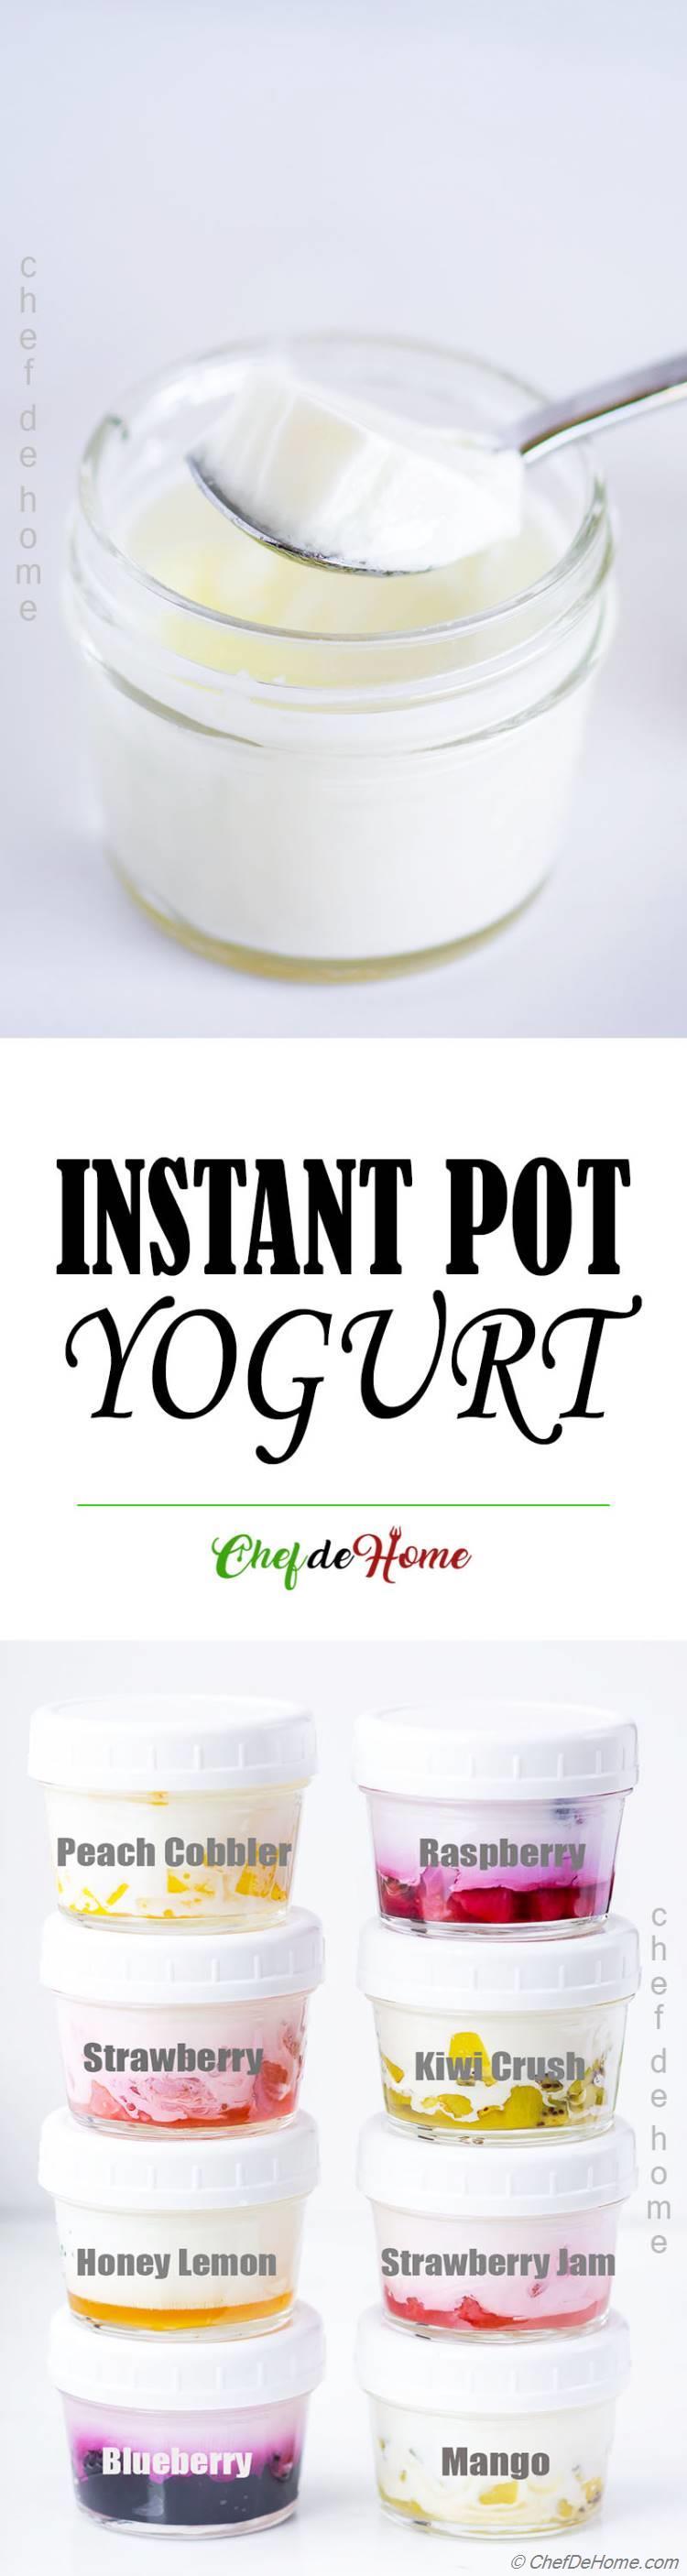 Making Yogurt in Instant Pot